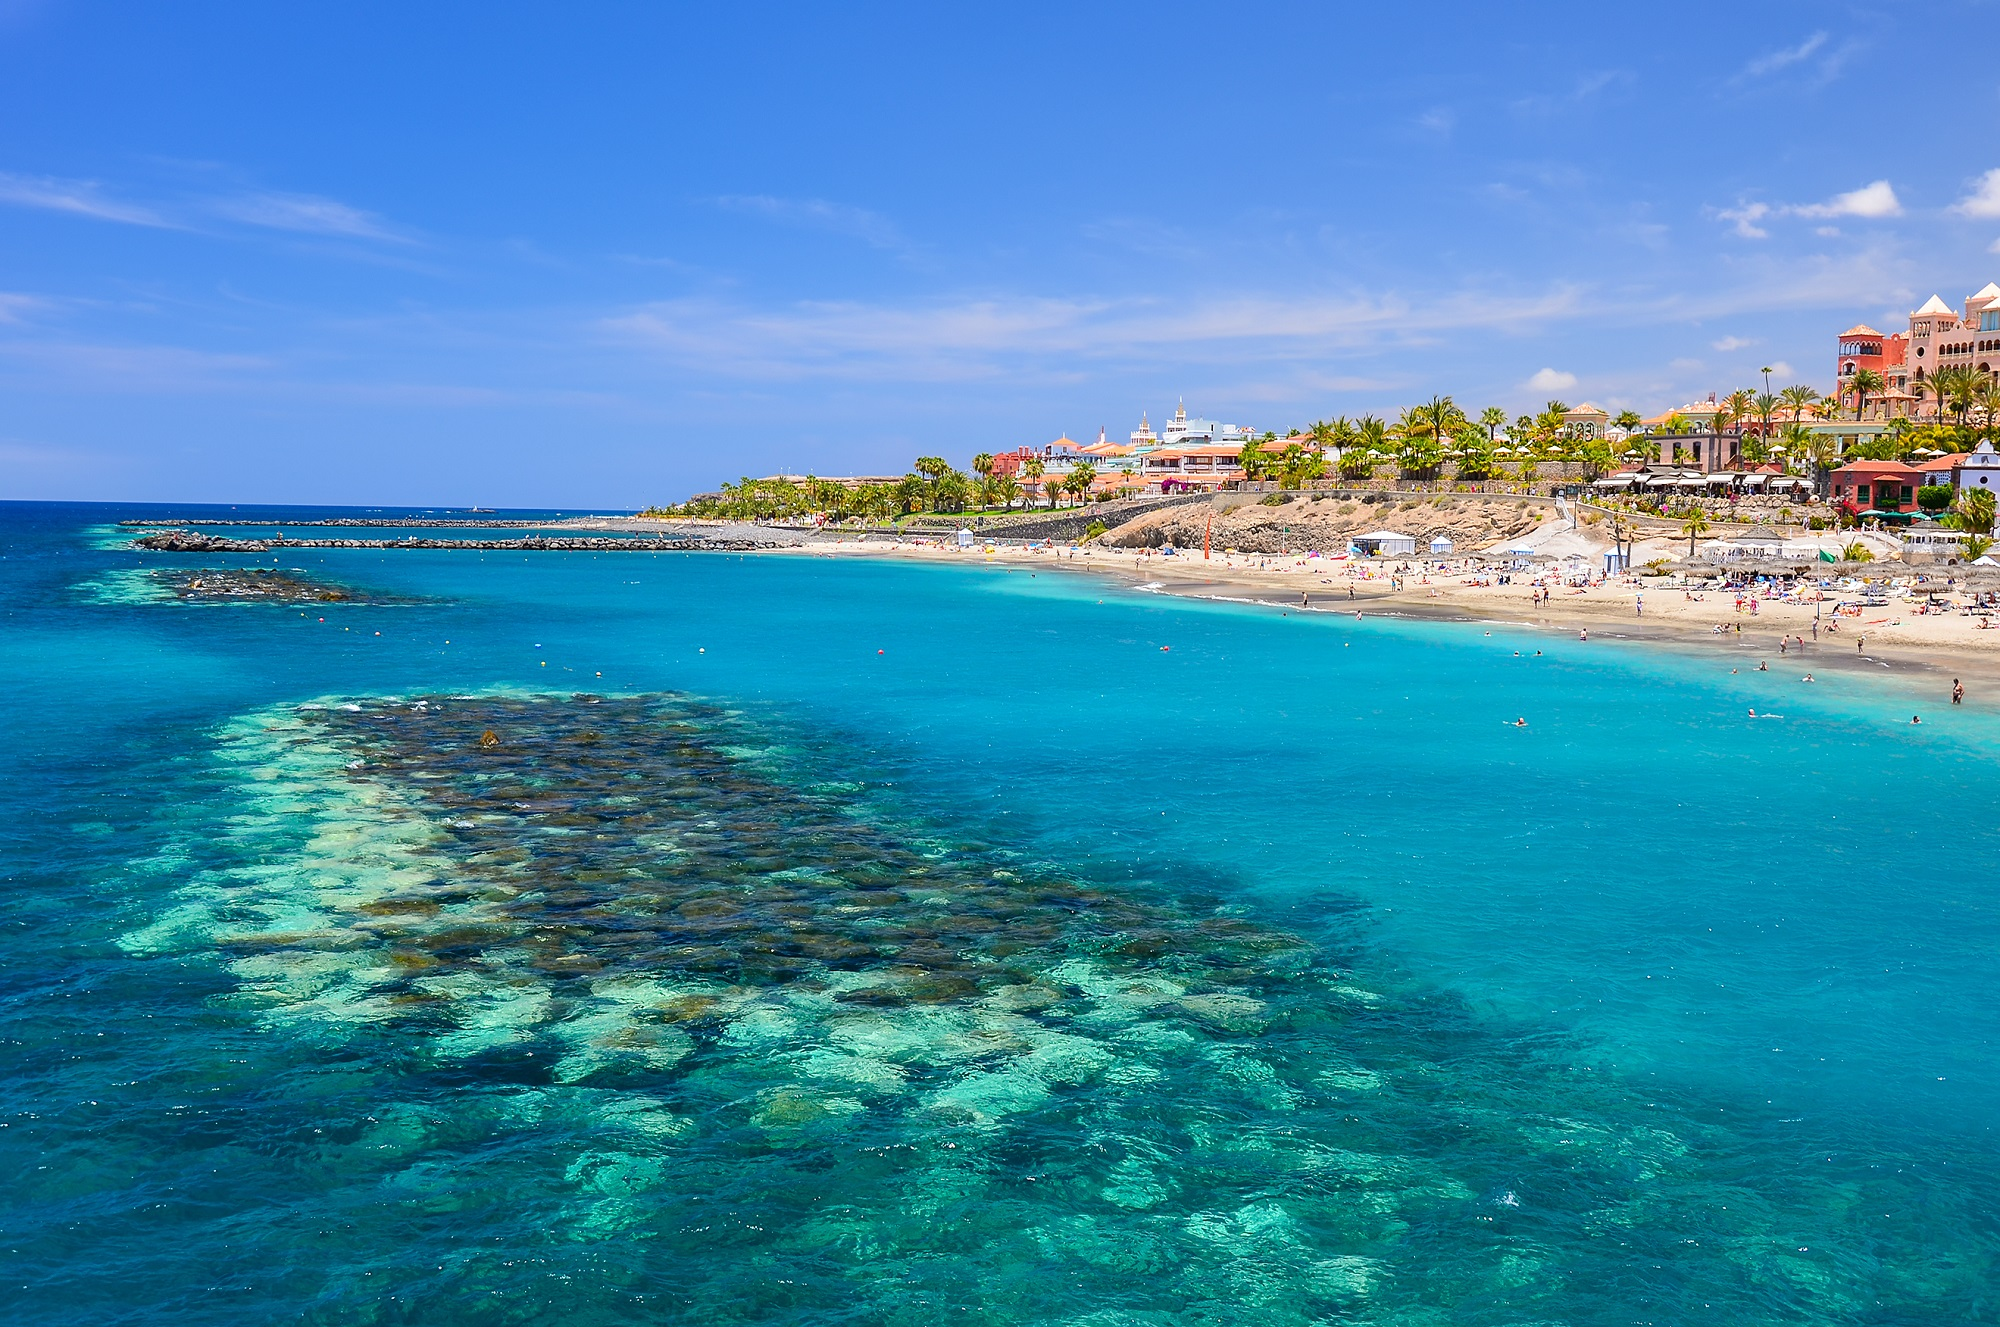 Ocean Beach Resort And Holiday Park